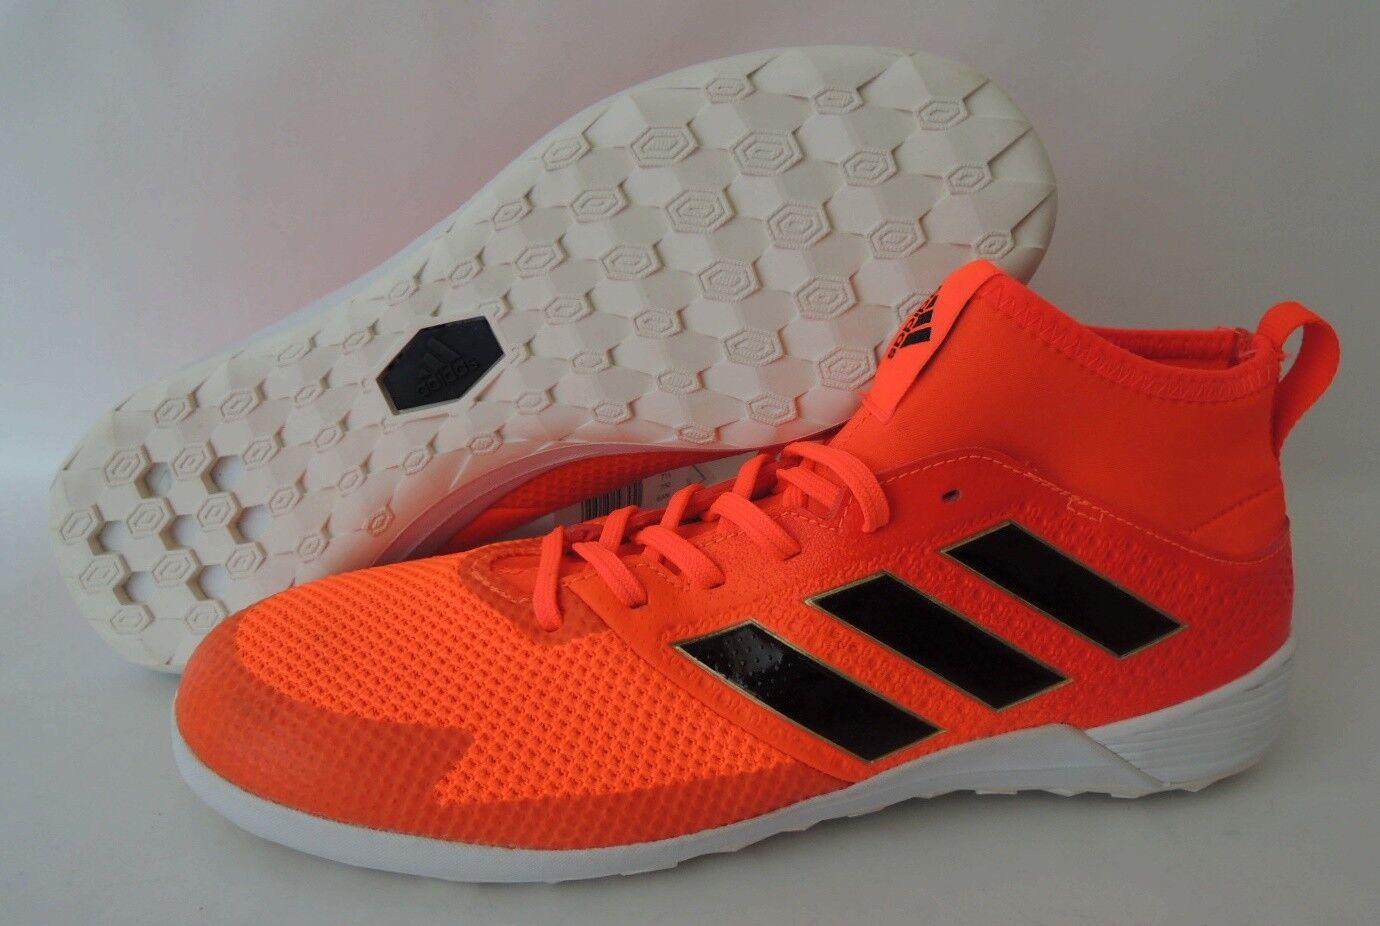 NEU adidas ACE Tango 17.3 IN 46 2/3 Hallen Fußballschuhe CG3710 Hallenschuhe TOP